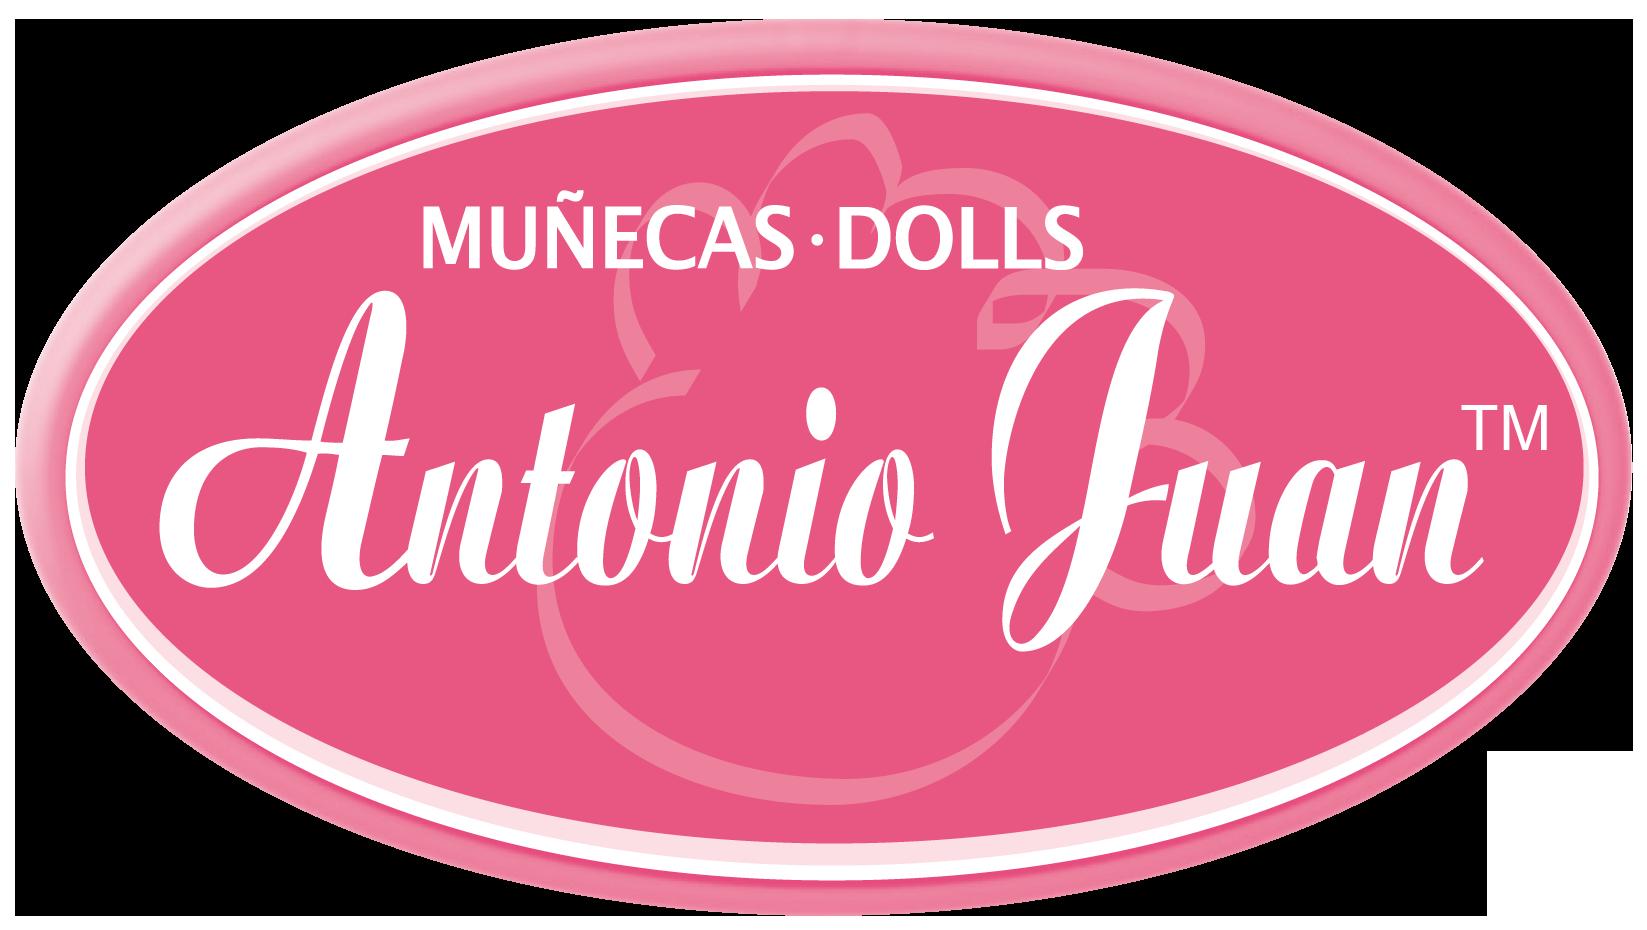 MUÑECAS ANTONIO JUAN, S.L.